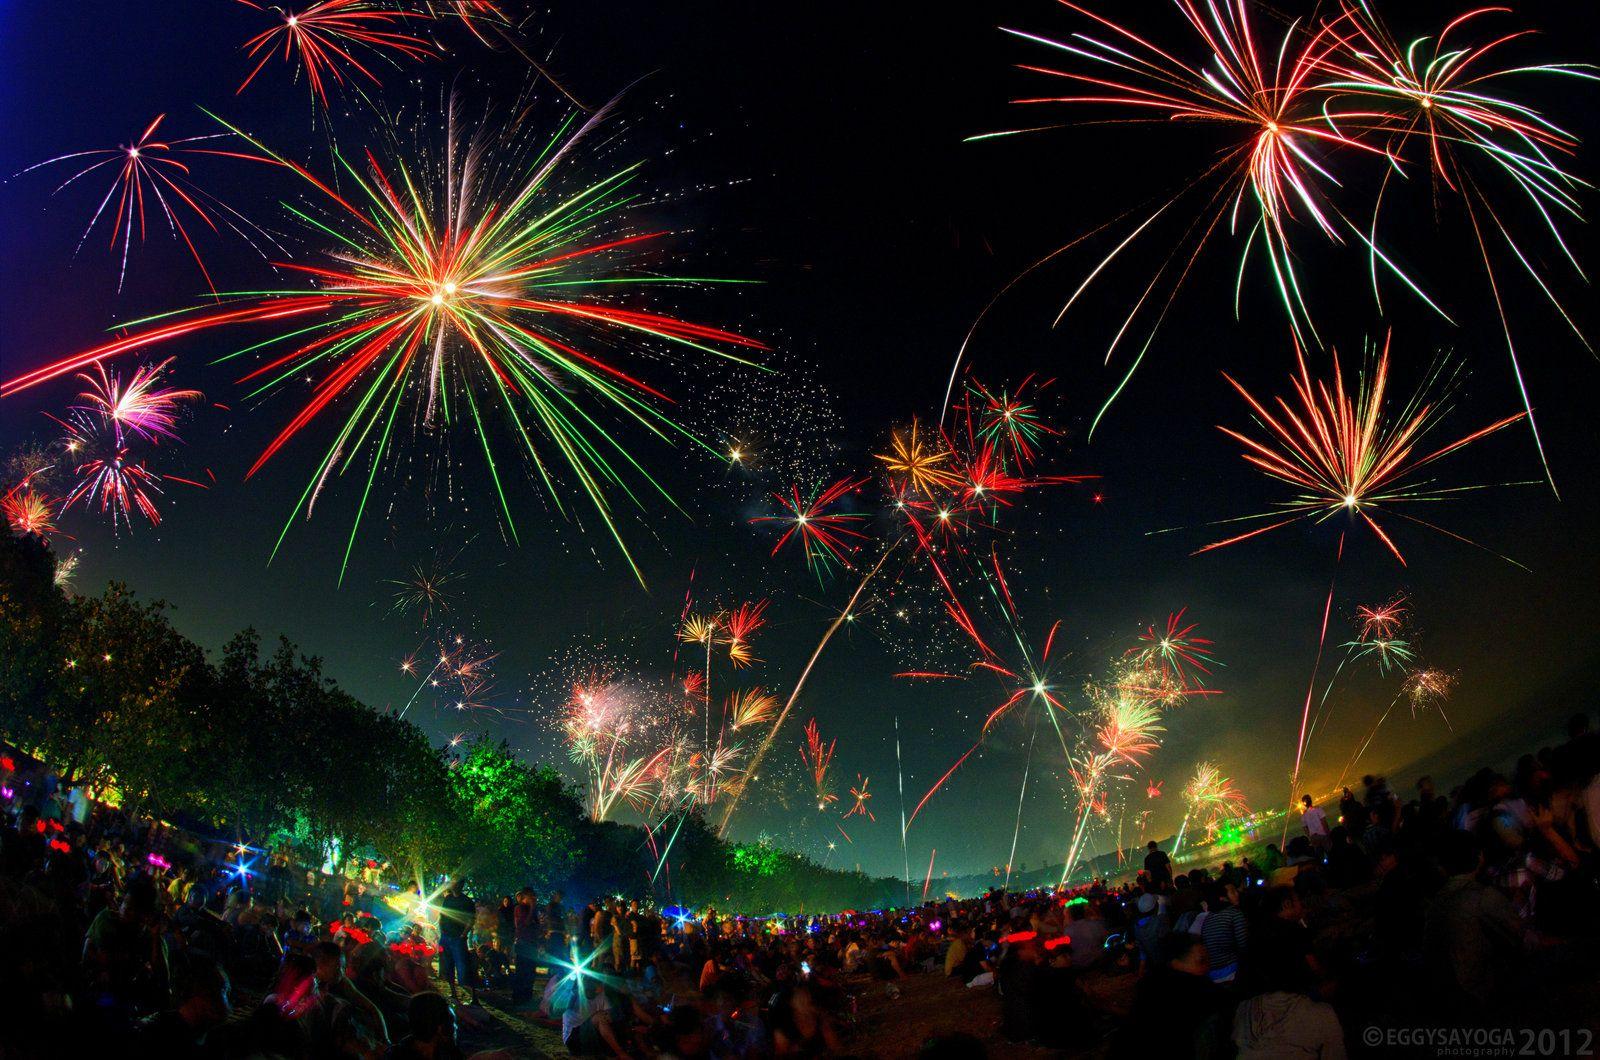 Kuta 2012 New Year Fireworks By Saiogaman Deviantart Com Fireworks Photography Fireworks Images Fireworks Photo